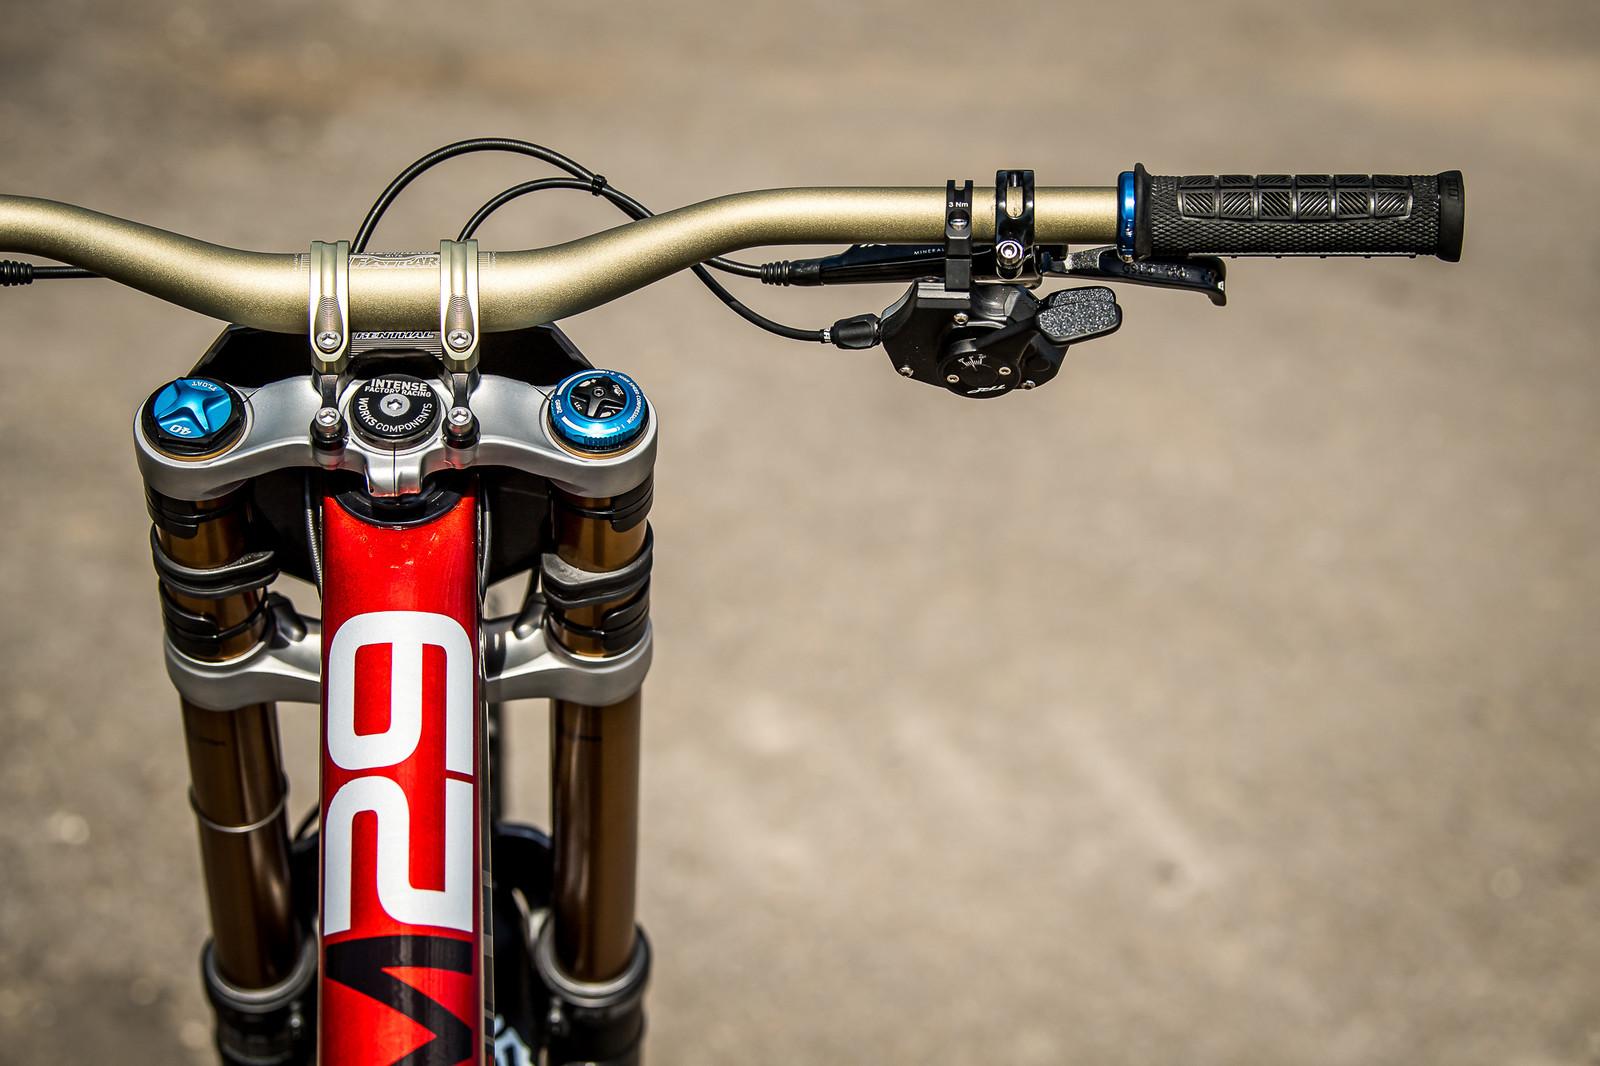 Neko Mulally's 2019 World Championships Intense M29 - Win Neko Mulally's World Champs Intense M29 - Mountain Biking Pictures - Vital MTB